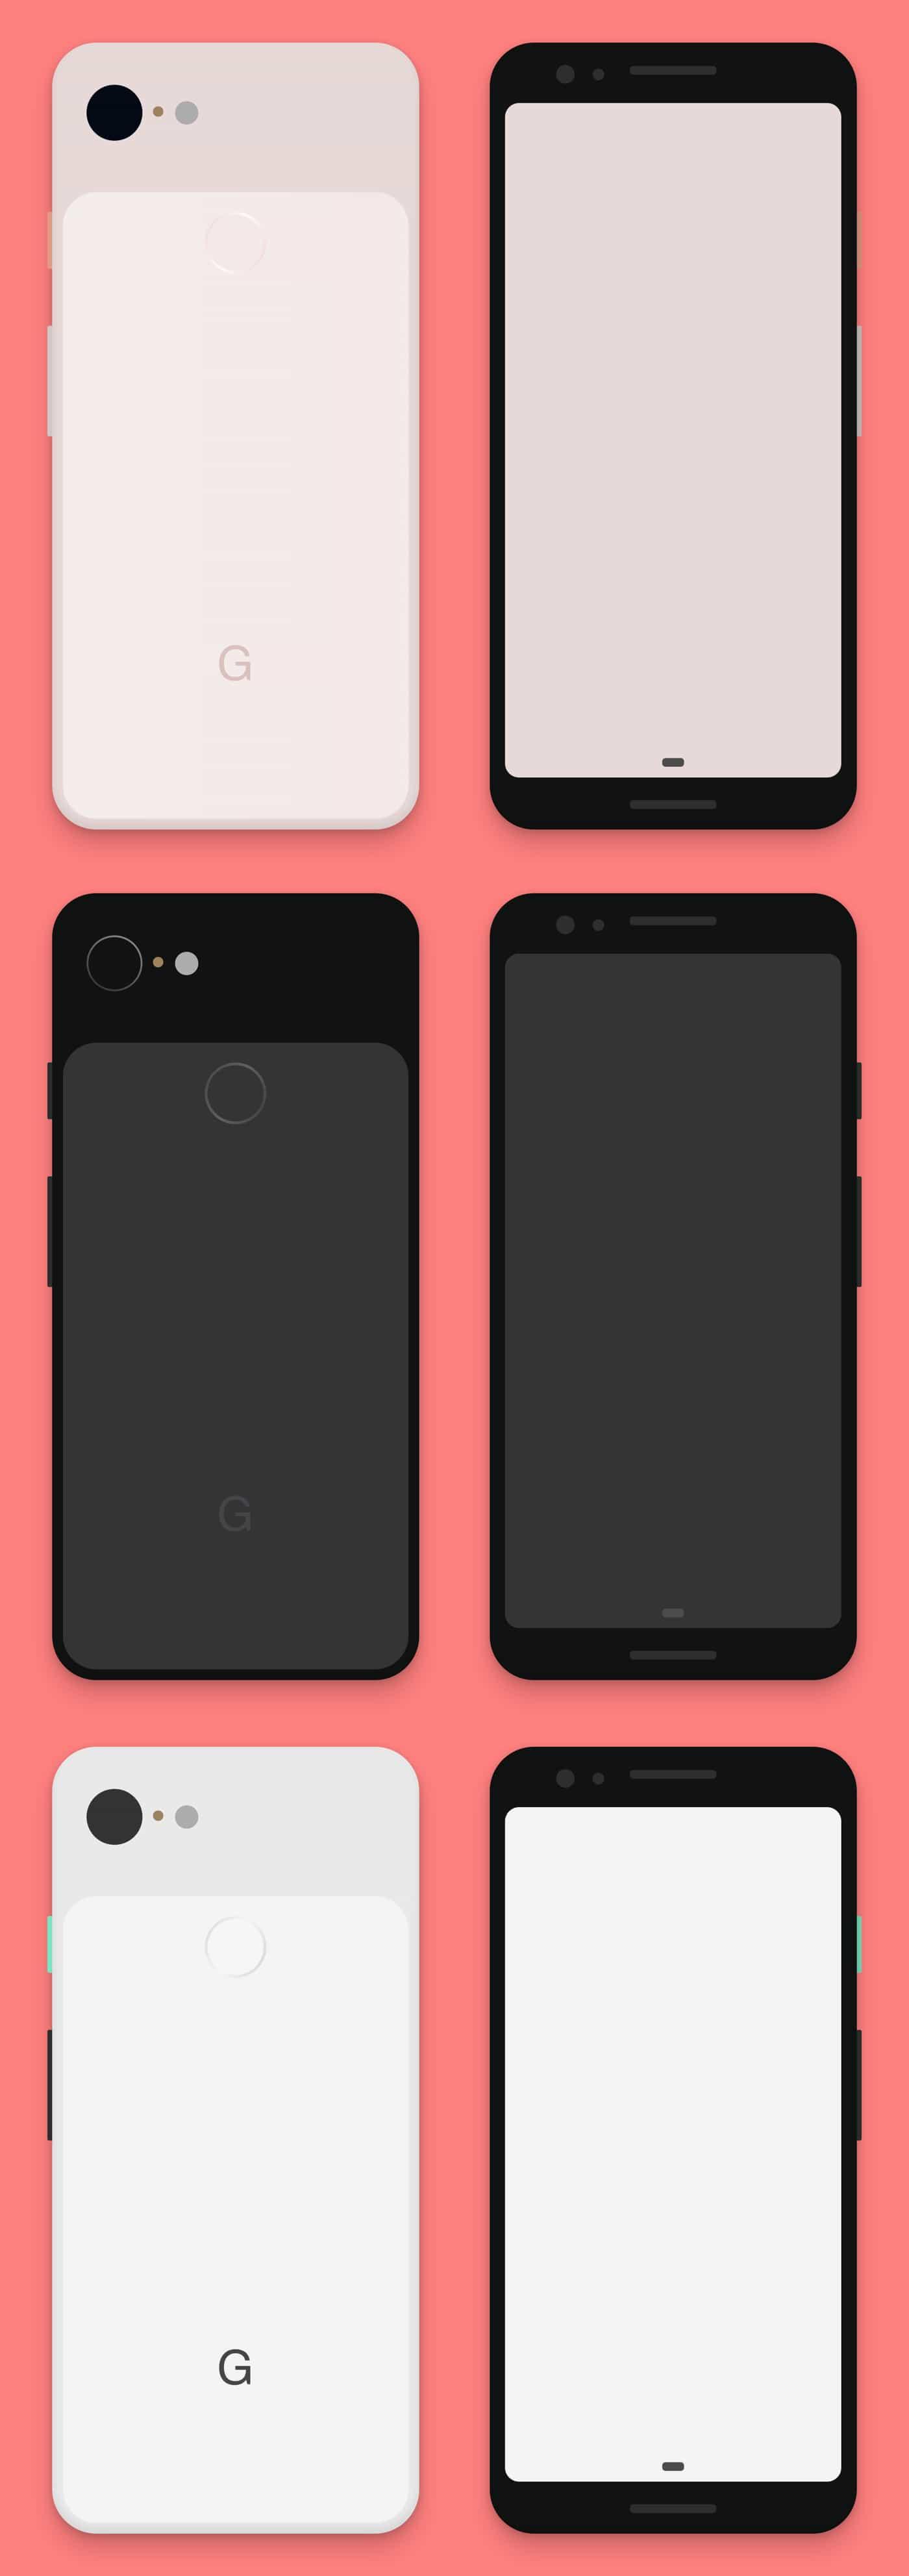 Google Pixel 3 Free Sketch Mockup from UIGarage